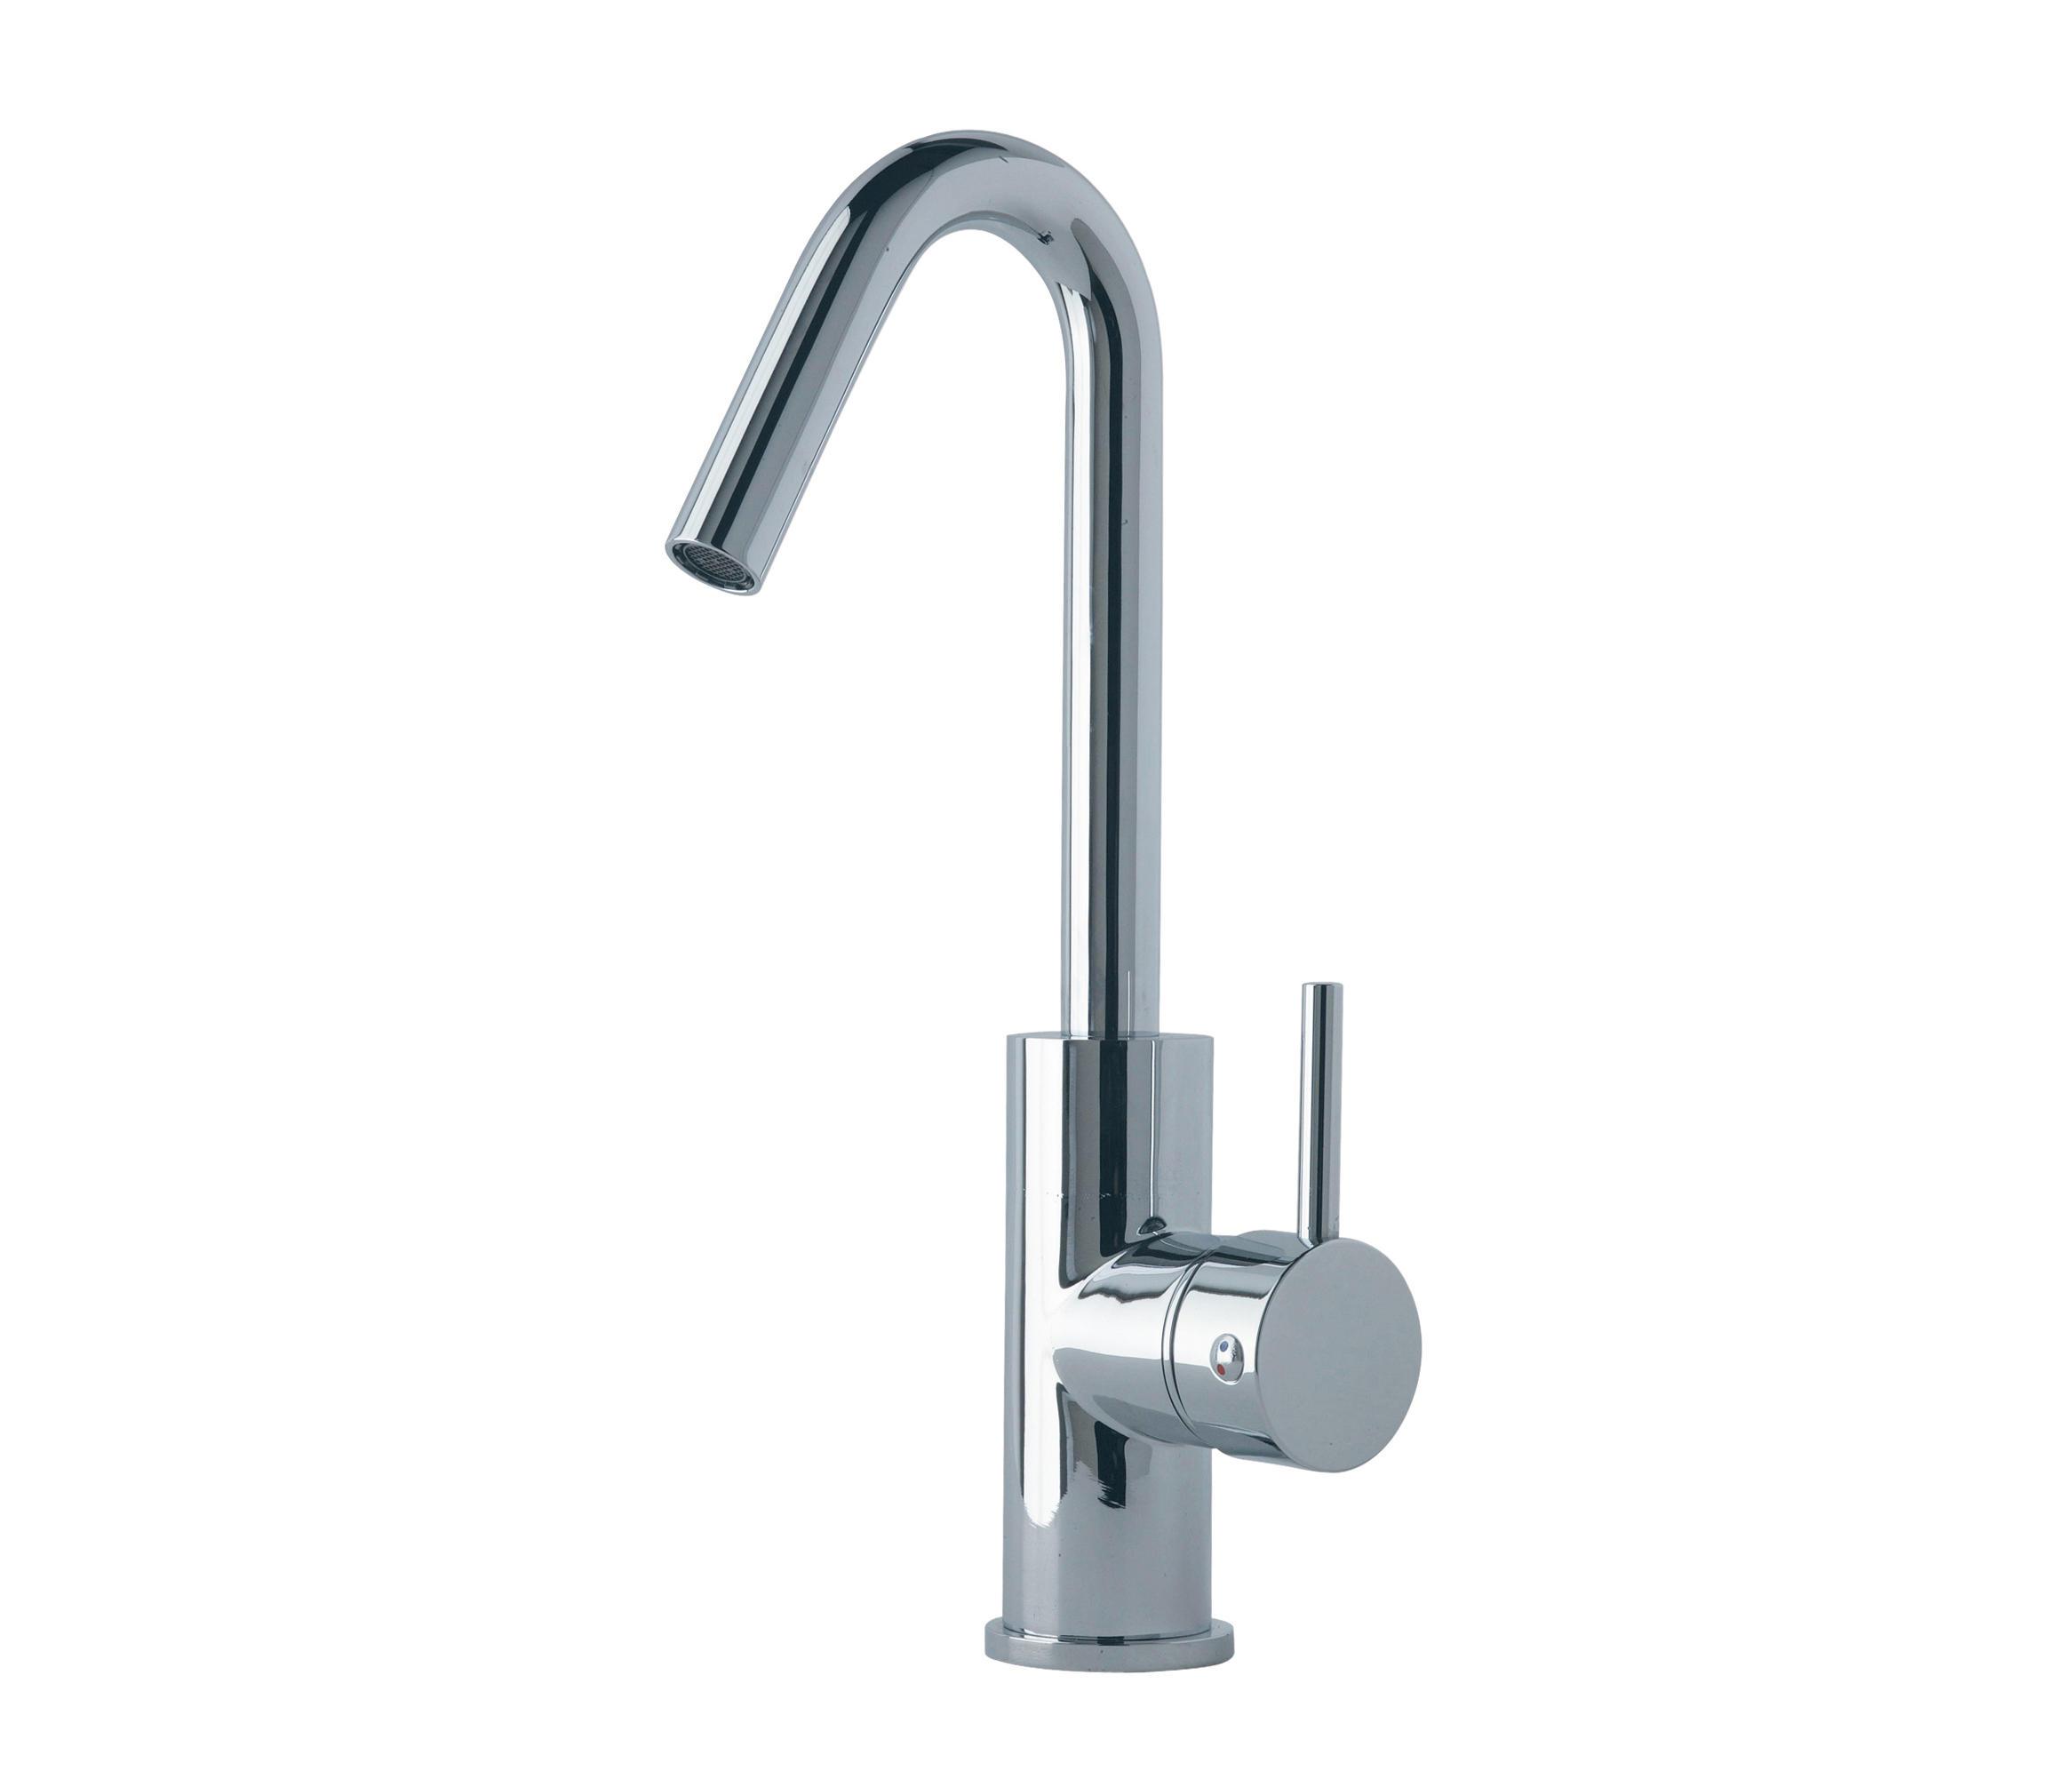 X CHANGE MONO 7510 - Wash basin taps from Rubinetterie Treemme ...